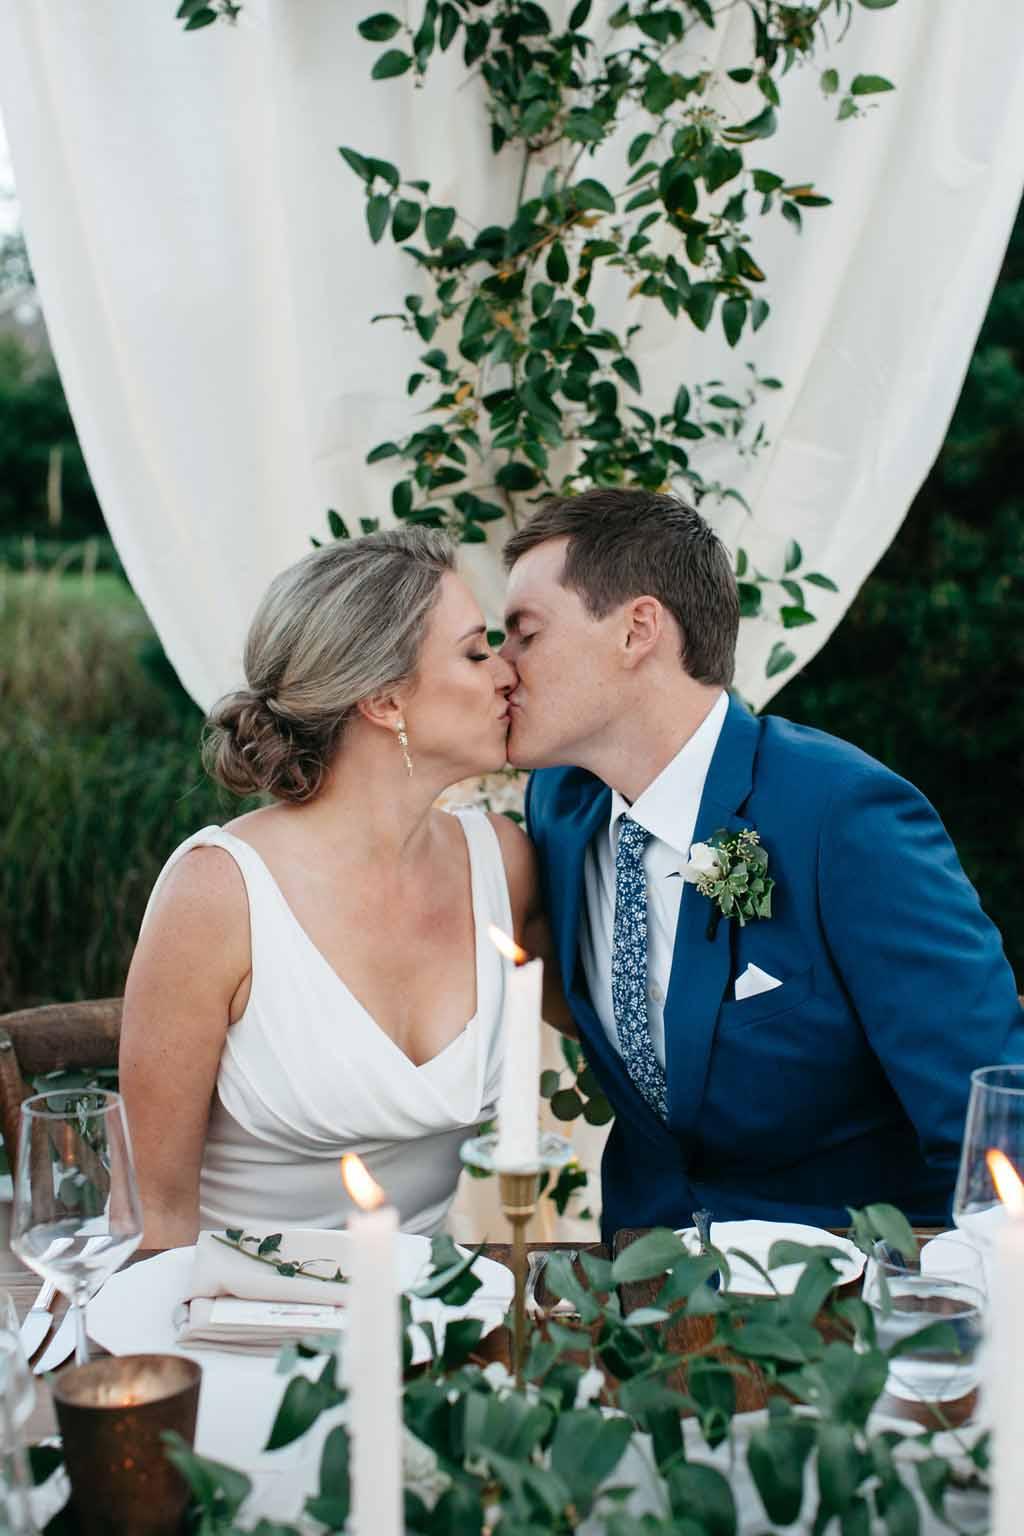 Bride and groom kissing at their wedding reception - Elegant Seattle Garden Wedding by Flora Nova Design Seattle